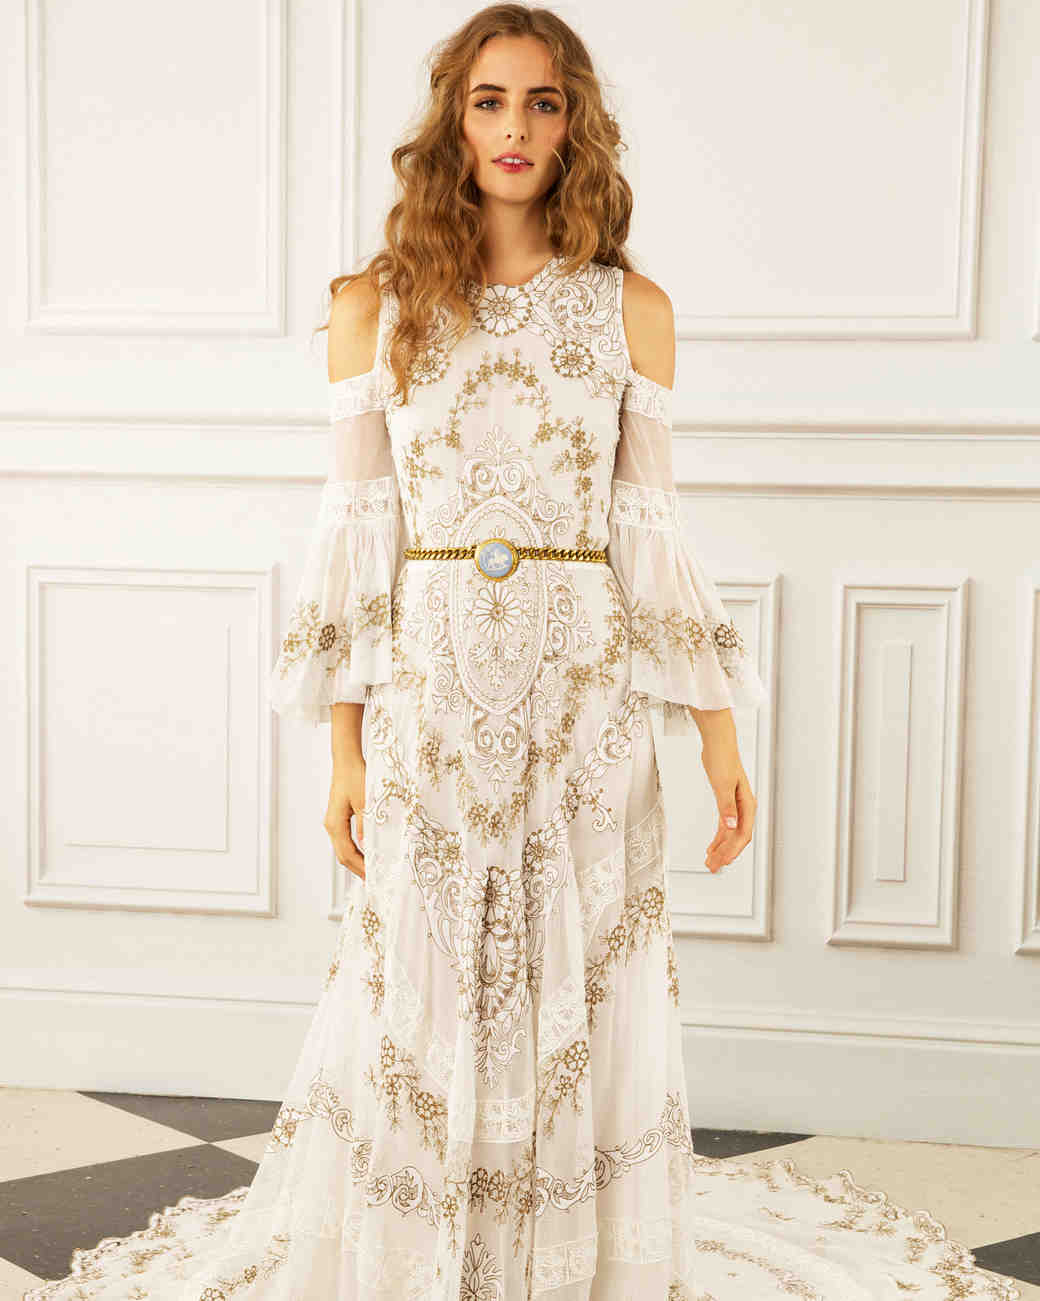 maria korovilas wedding dress spring 2017 shoulder cut out gold